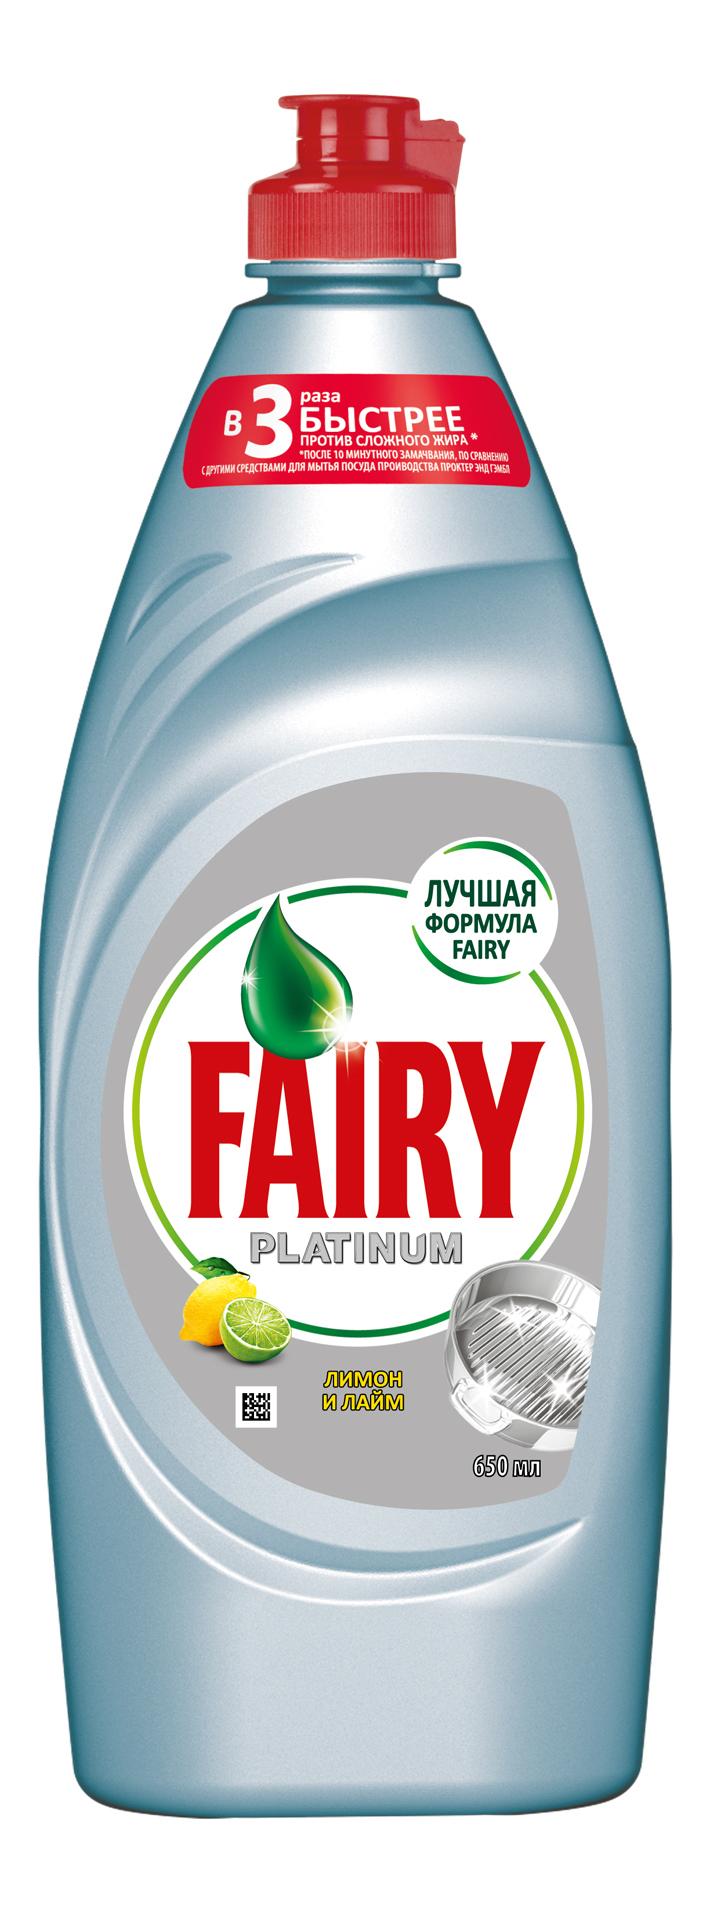 Средство для мытья посуды Fairy лимон и лайм 650 мл